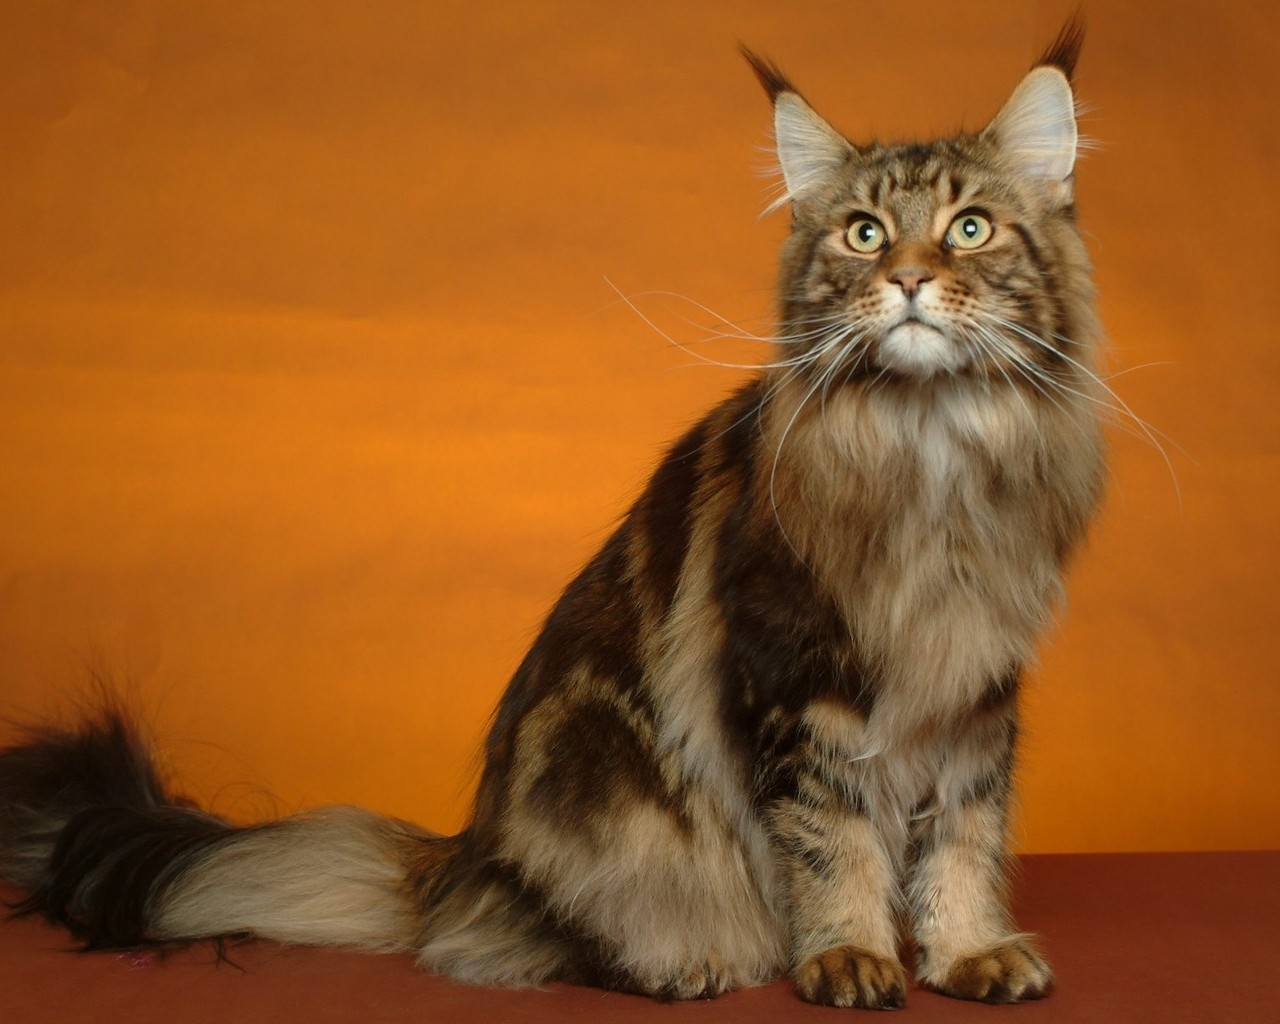 Мейн кун - дикая и домашняя кошка